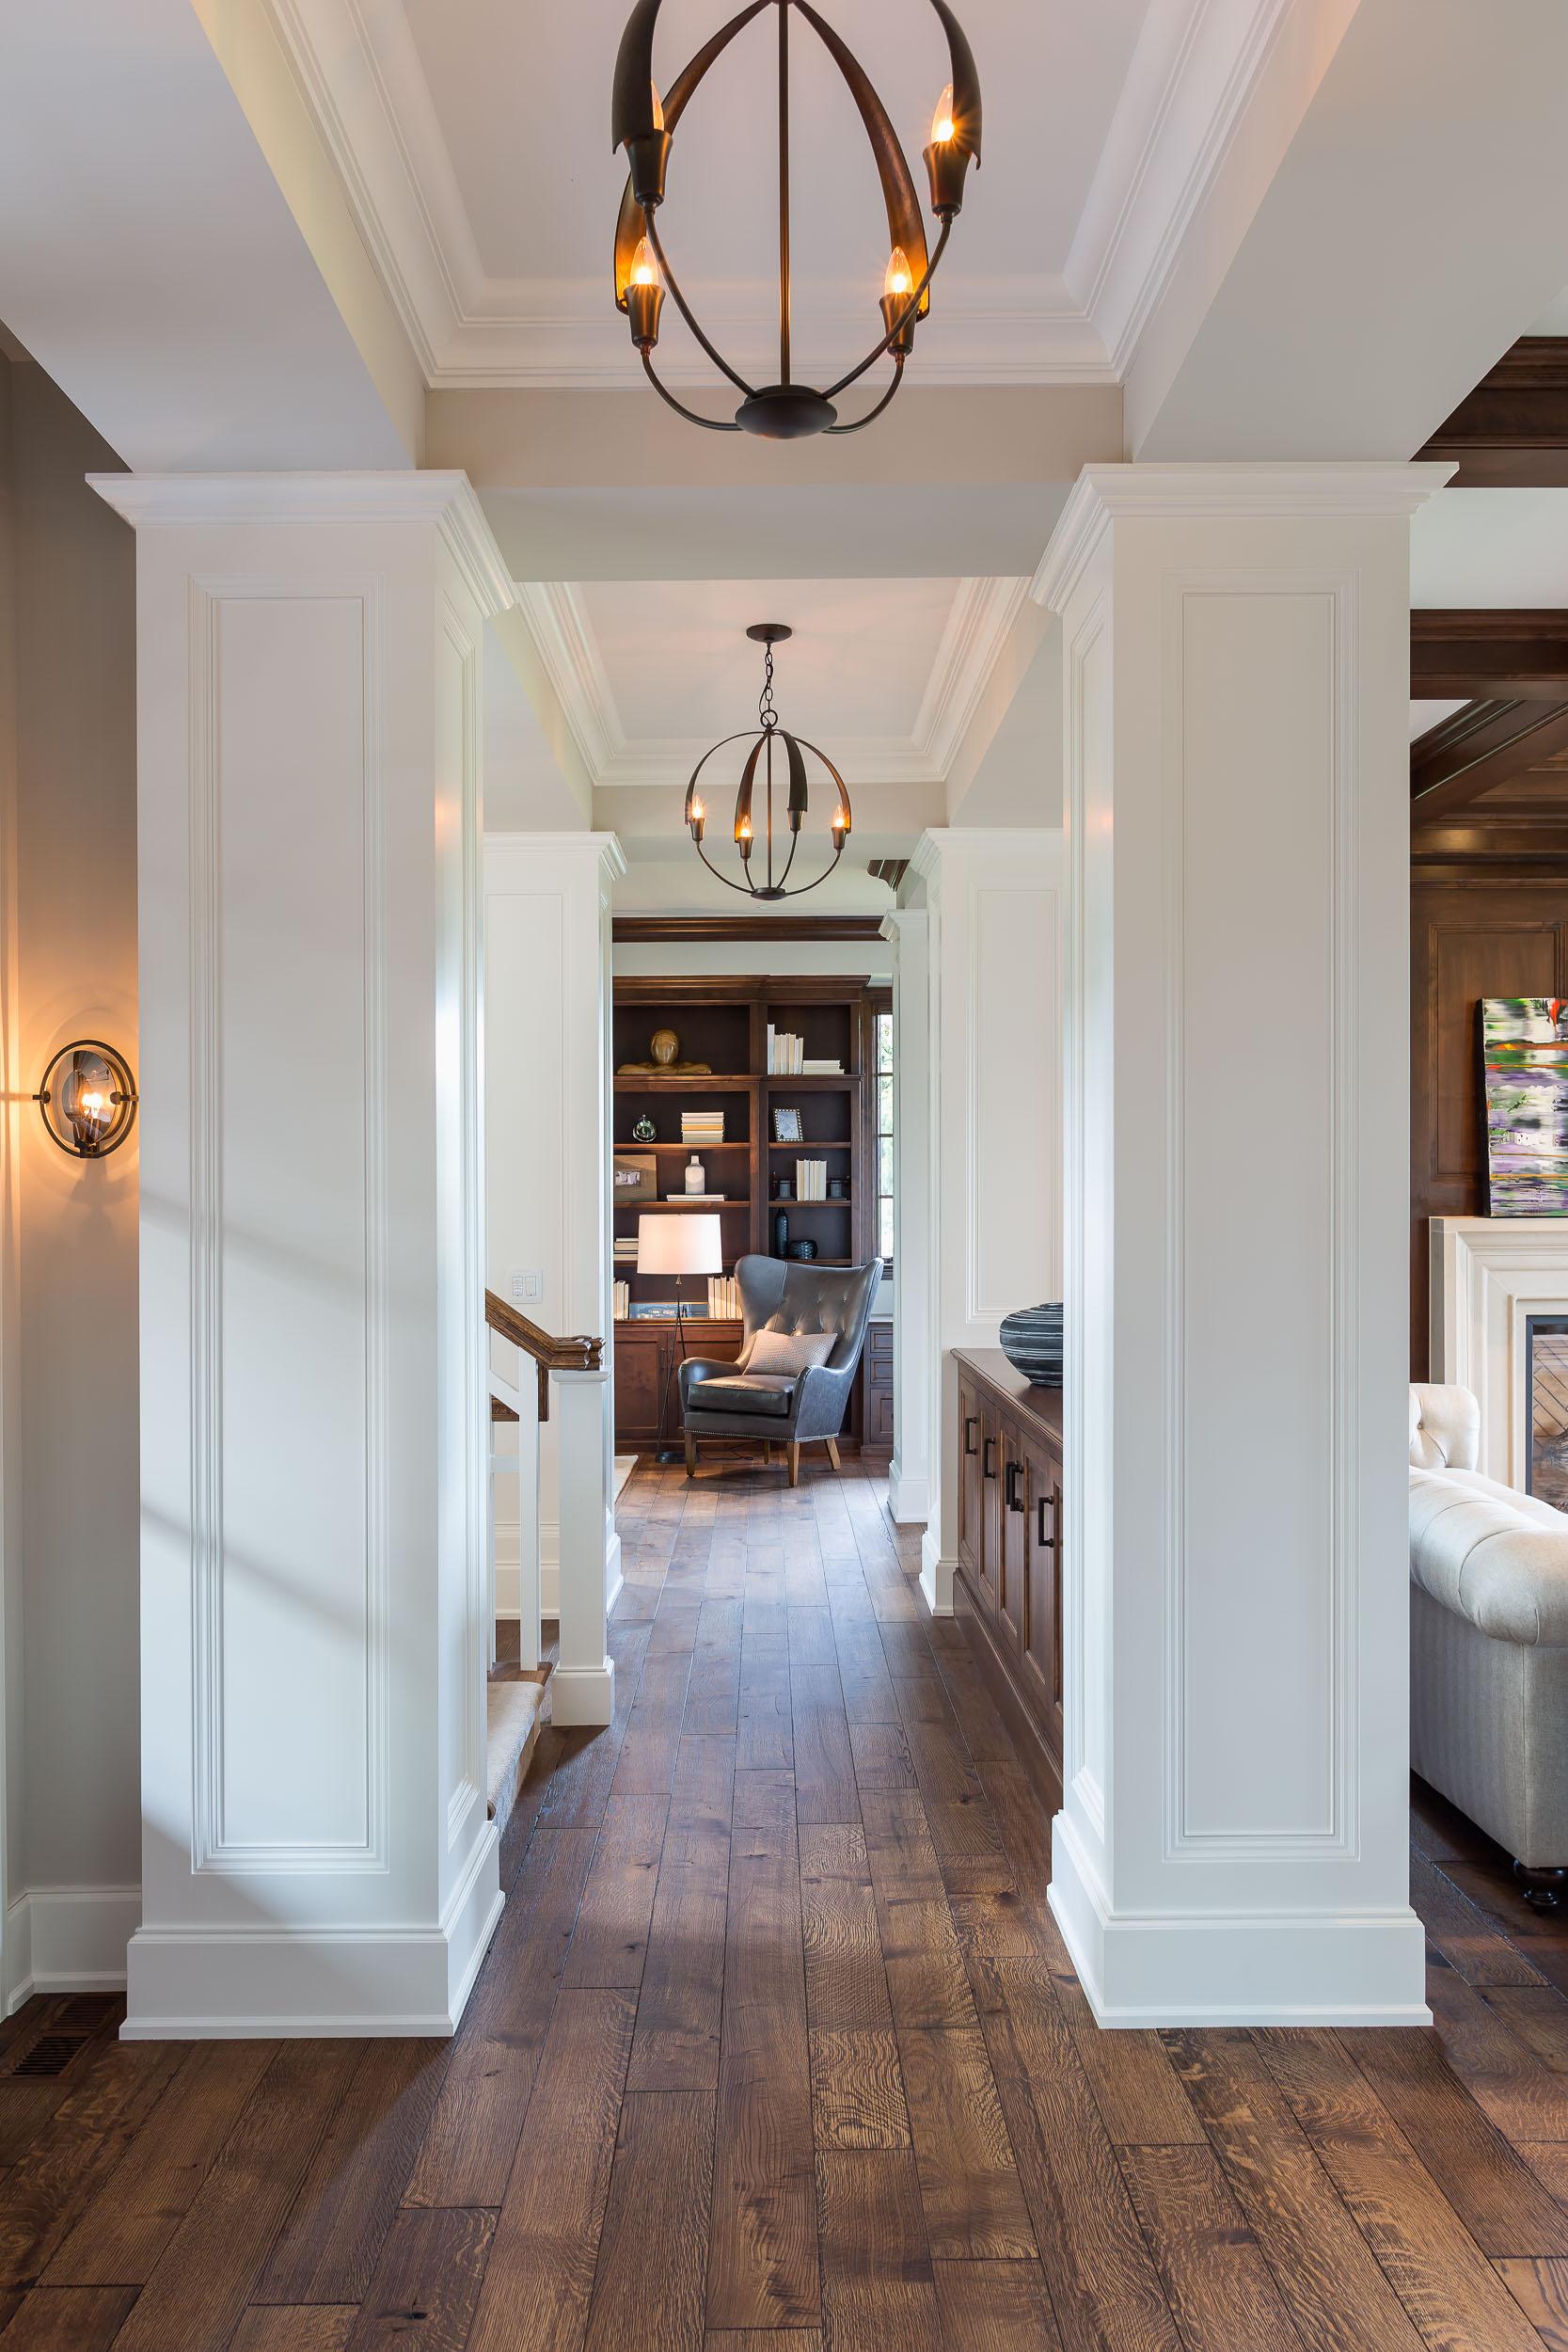 Orono Artisan Home Hallway Image